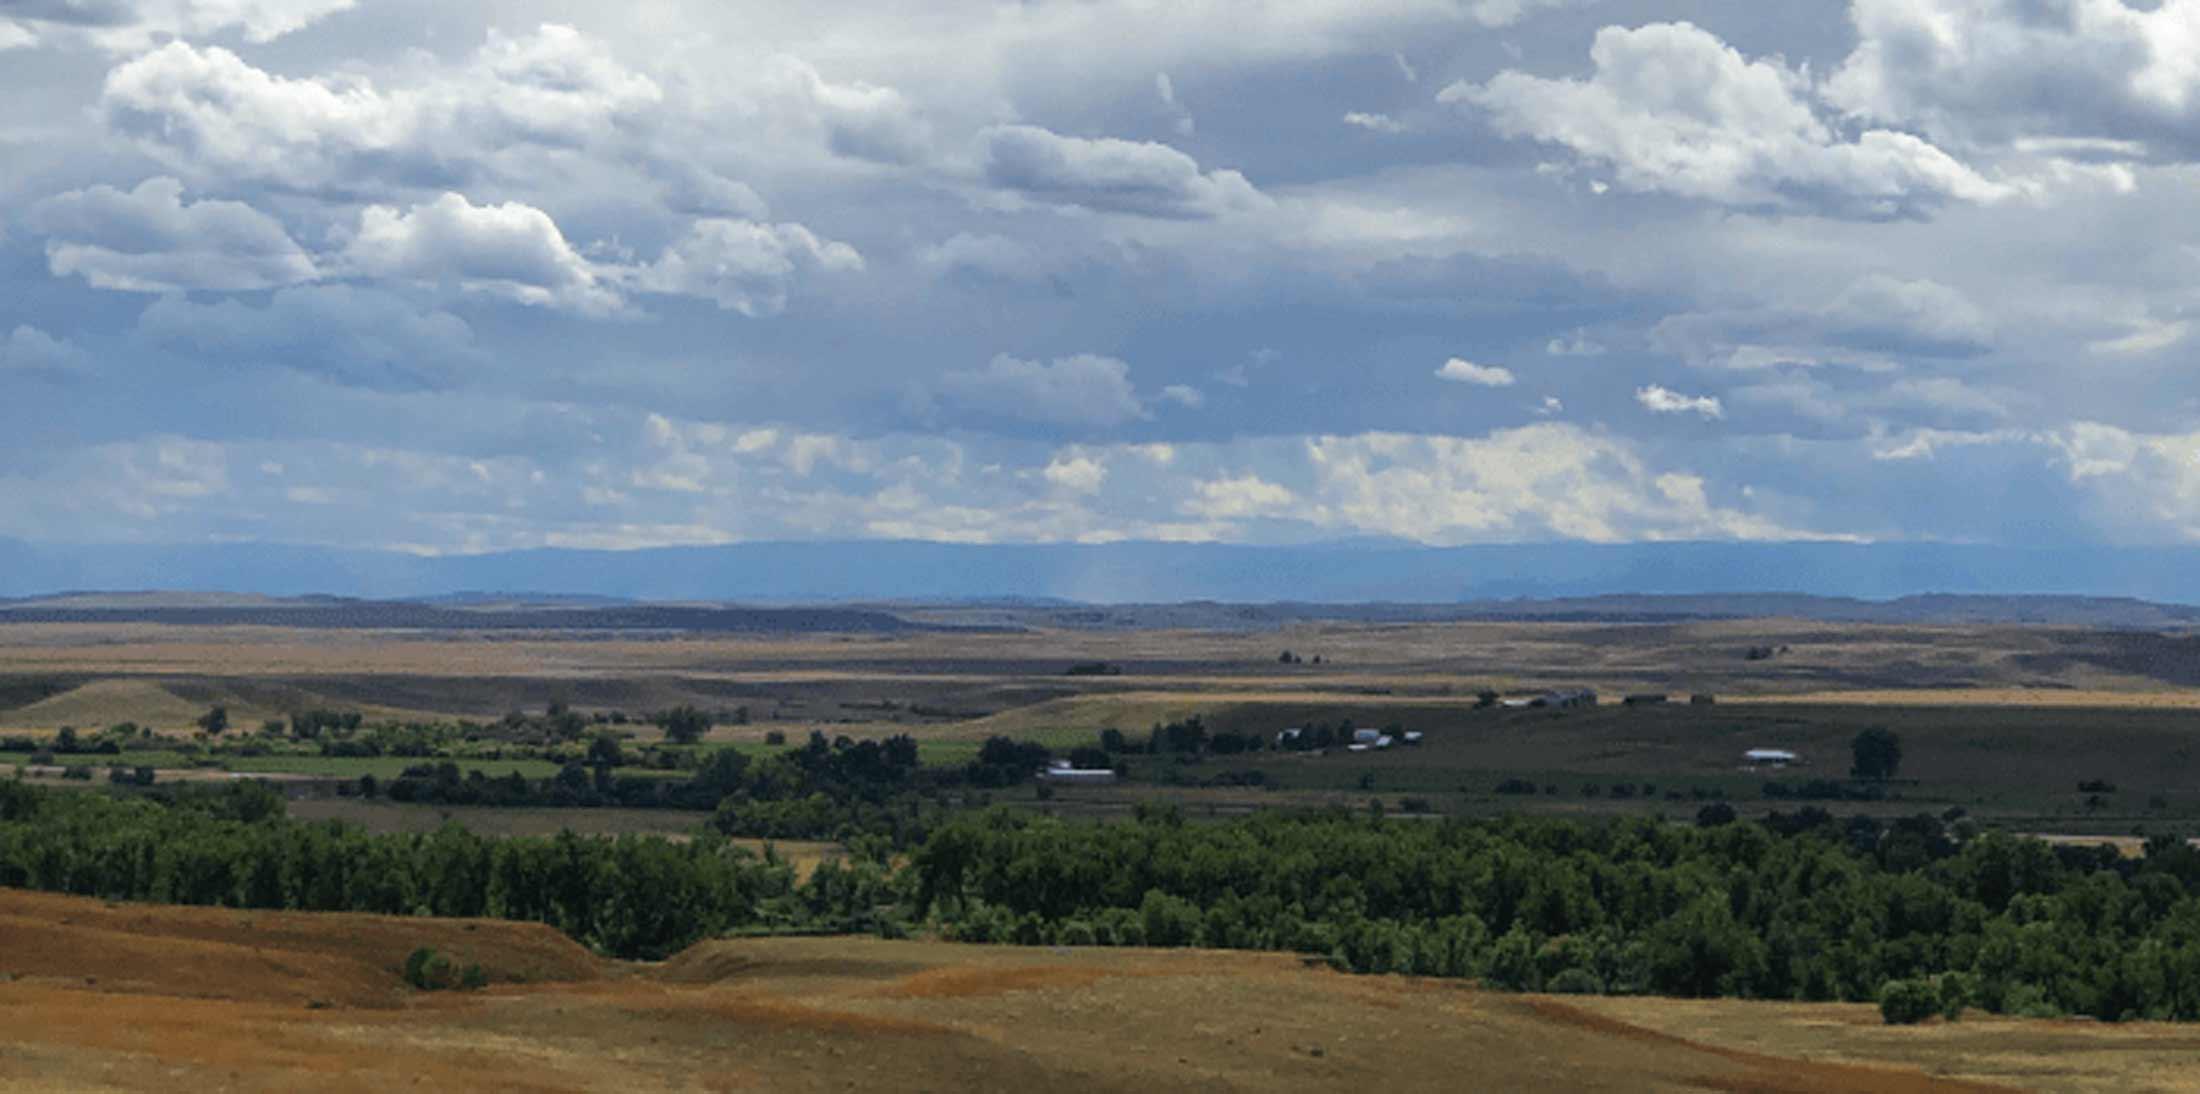 The Wild West: Billings, Montana